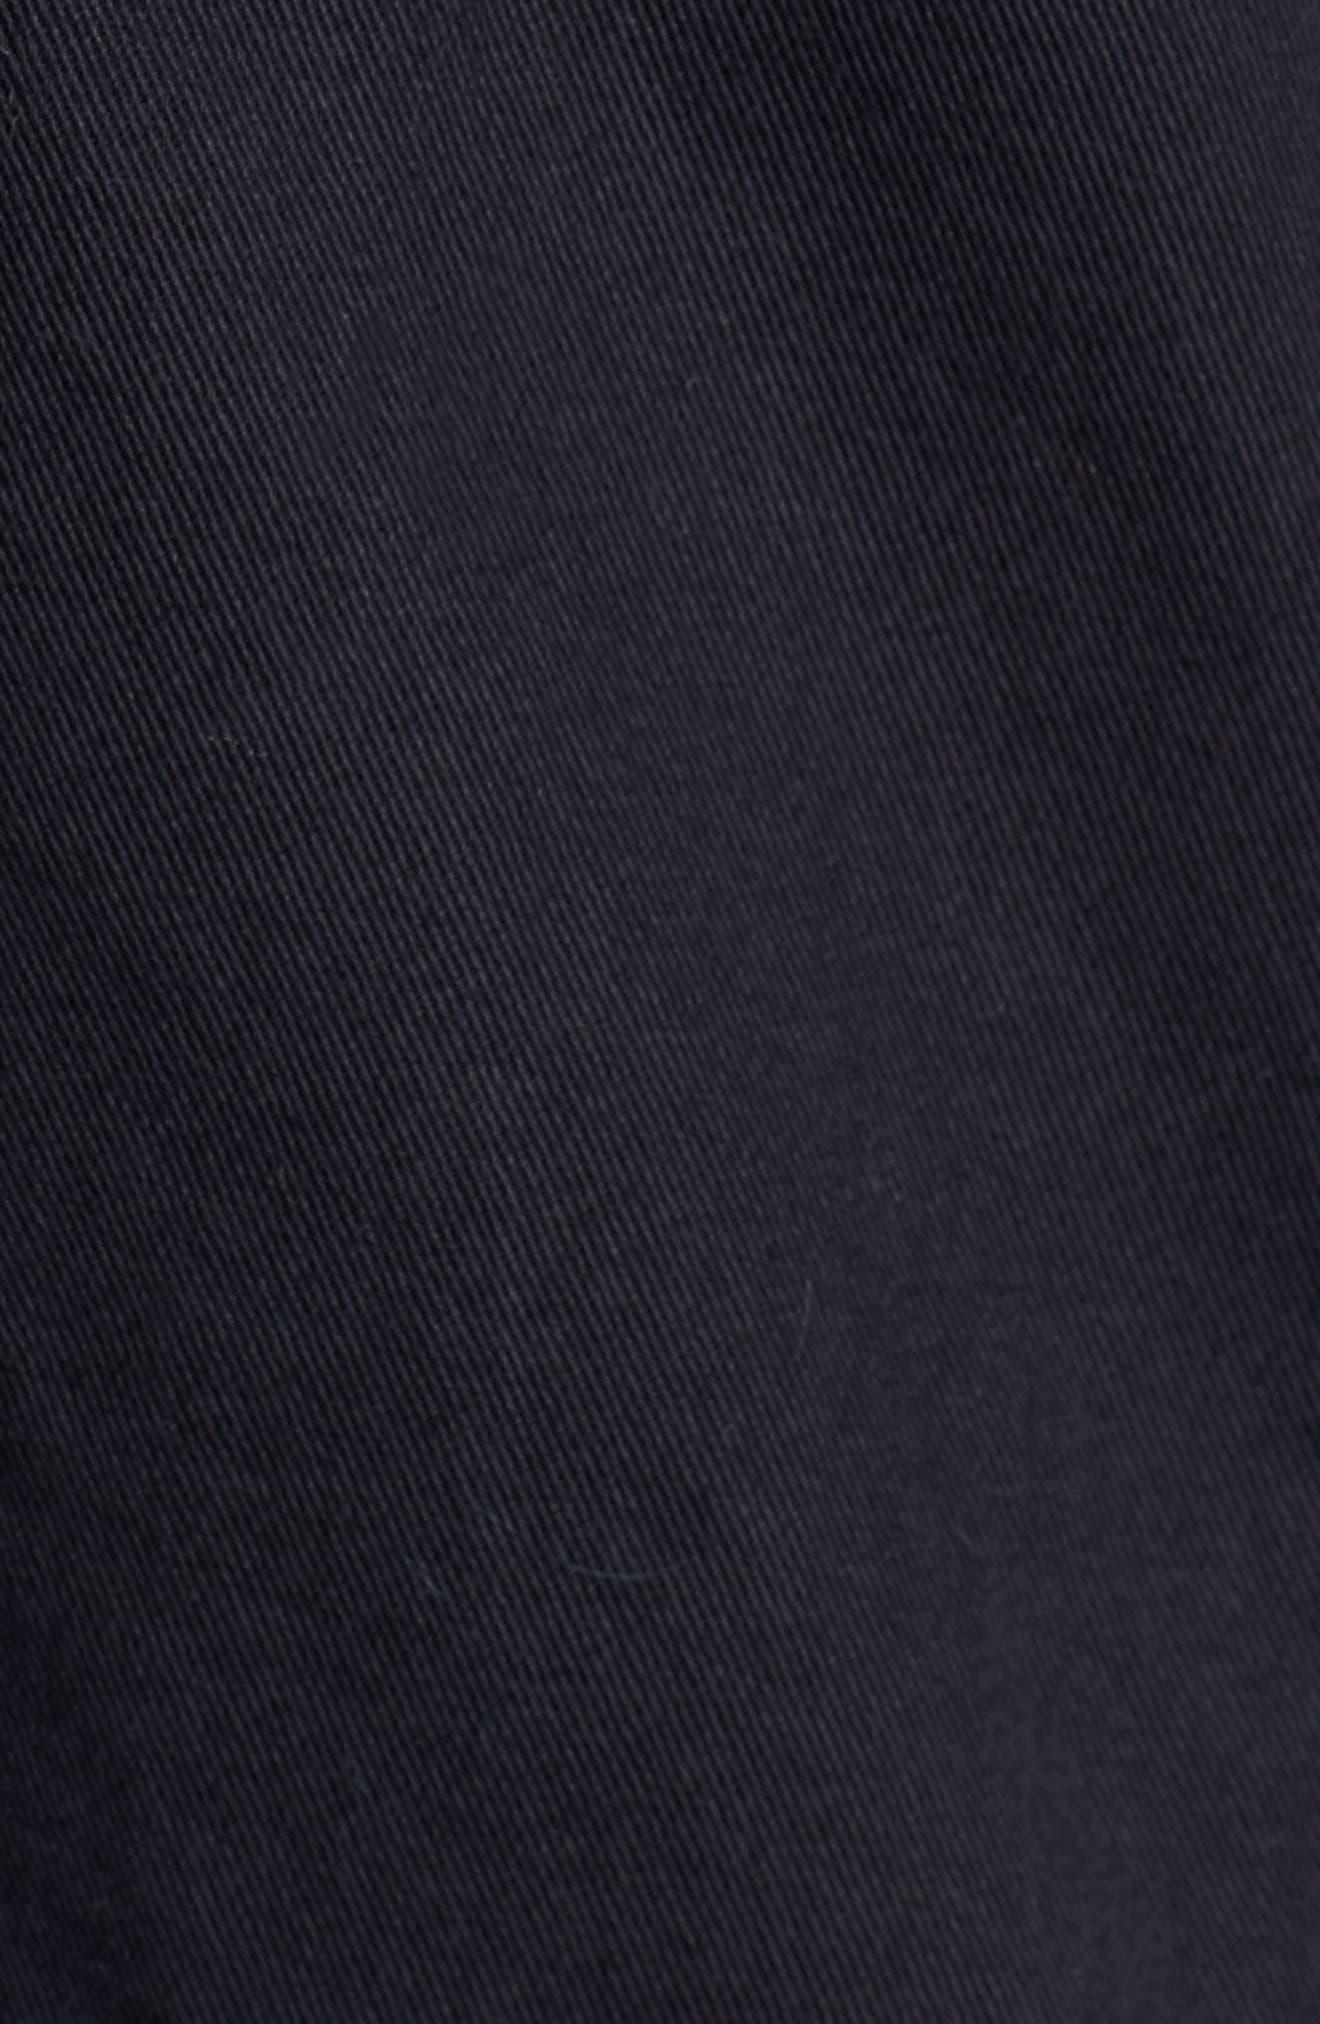 Embellished Utility Jacket,                             Alternate thumbnail 11, color,